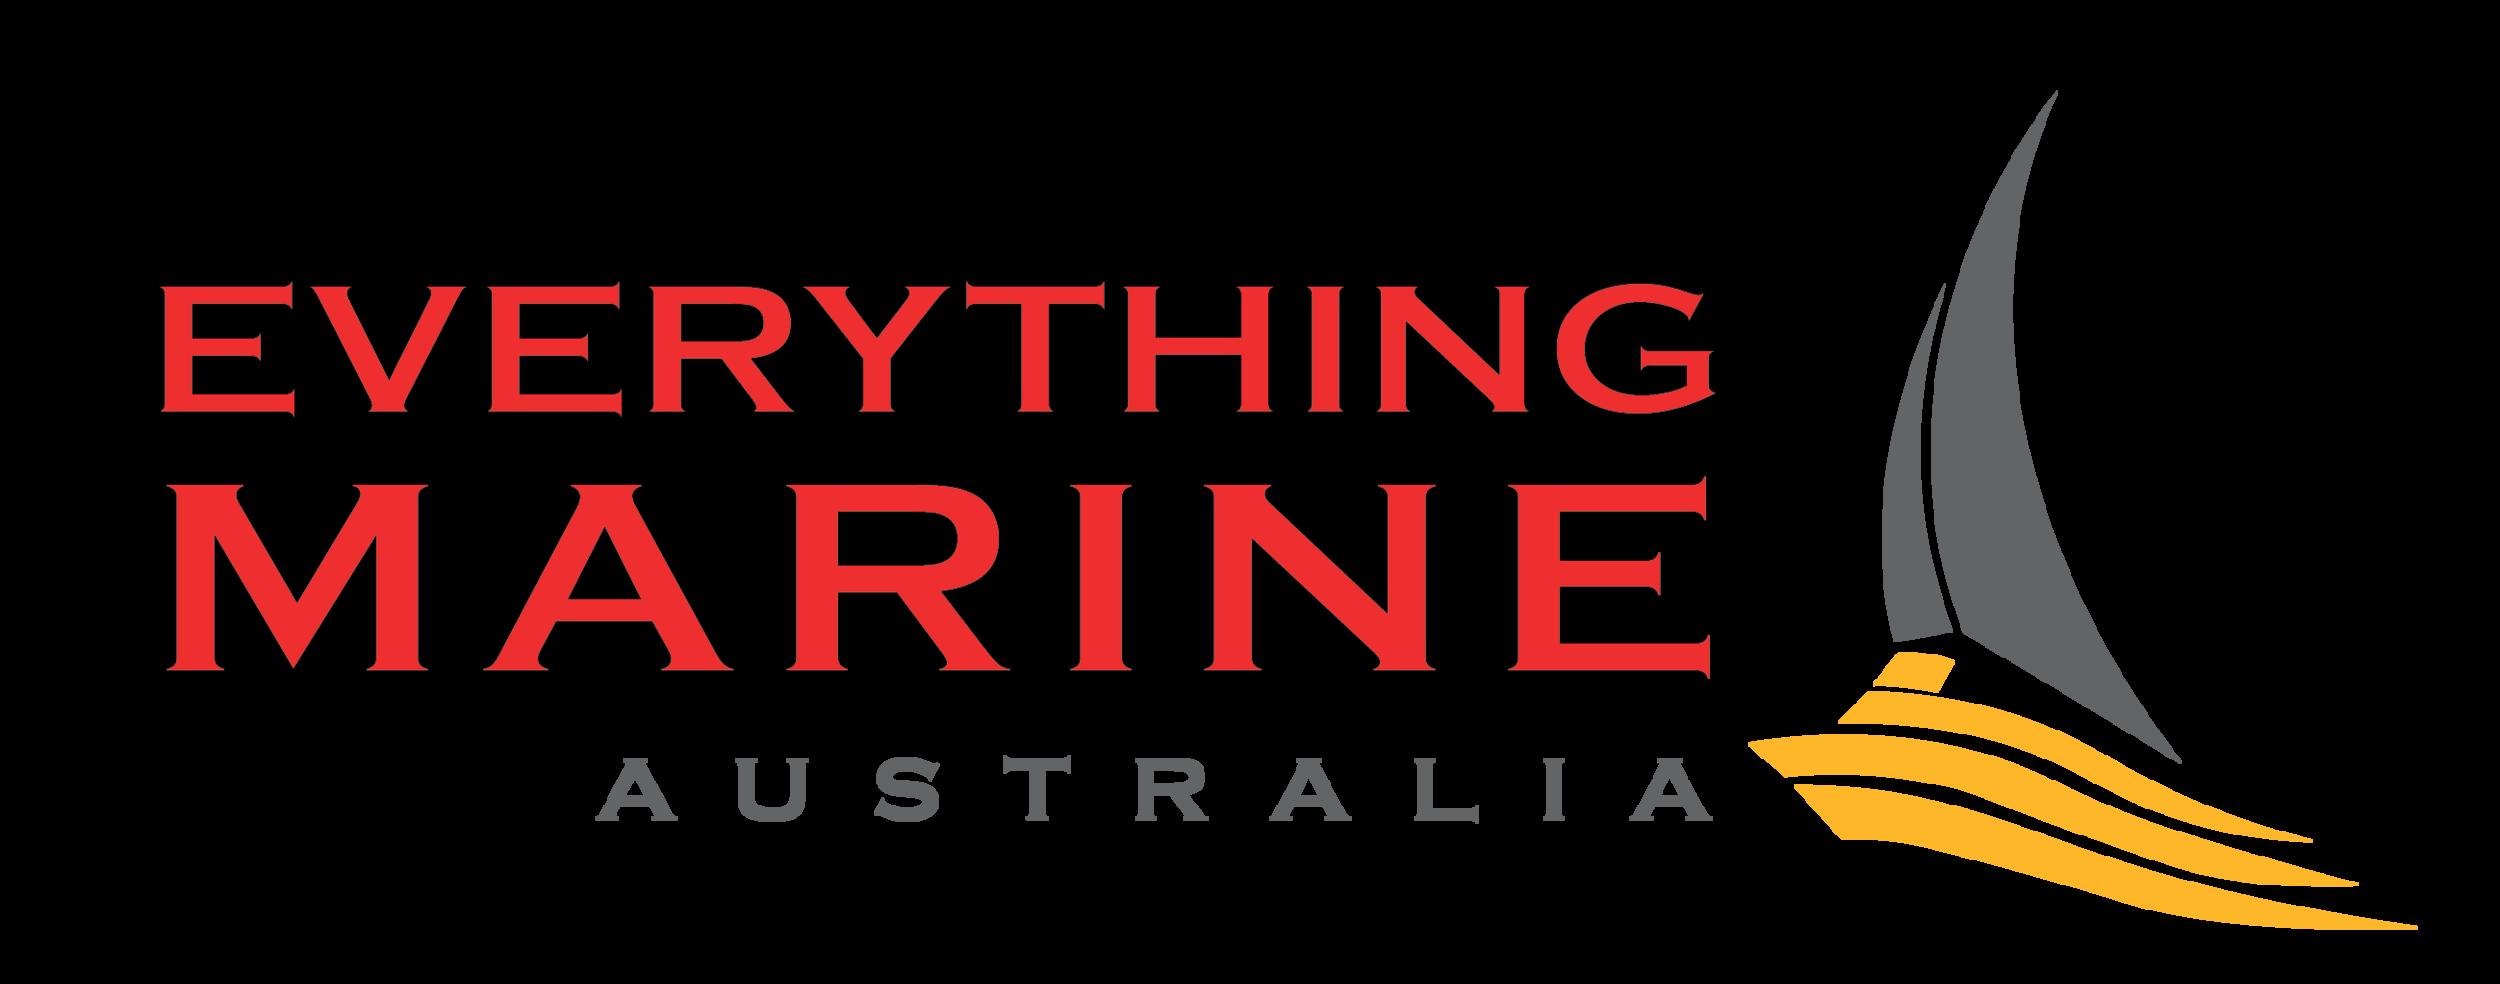 Everything Marine